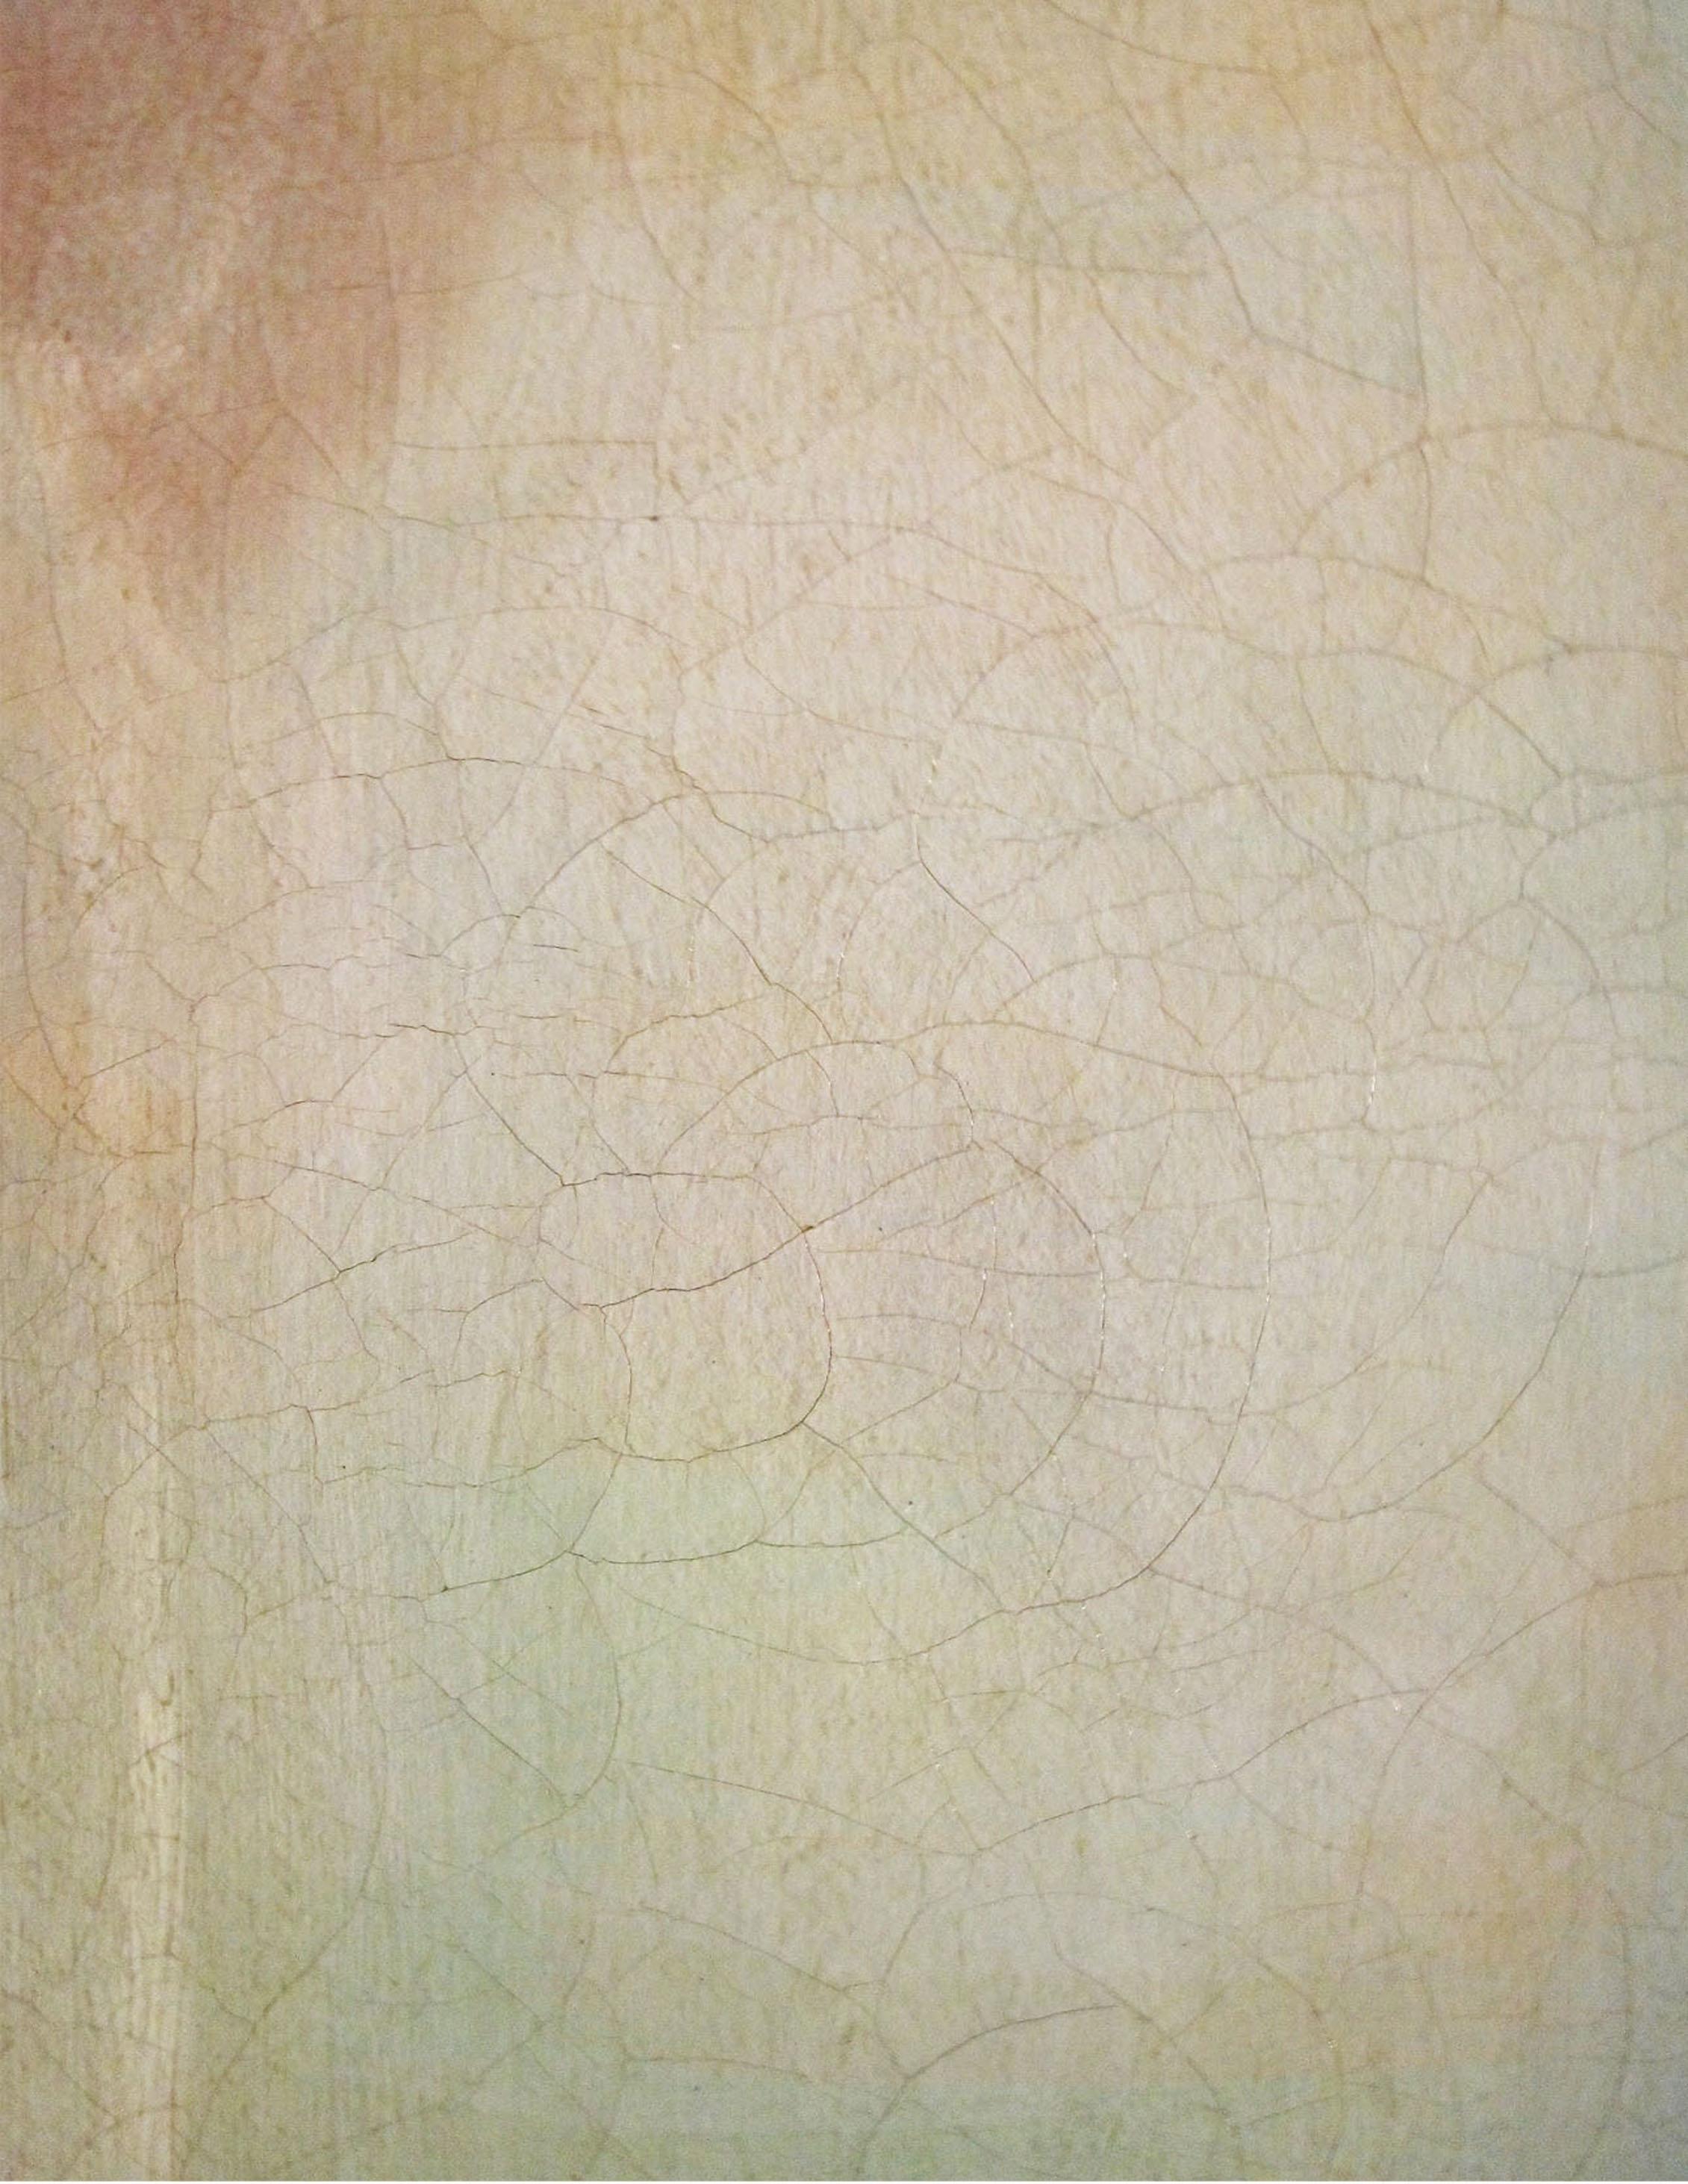 Best 48 Document Wallpaper on HipWallpaper Document Background 2261x2926